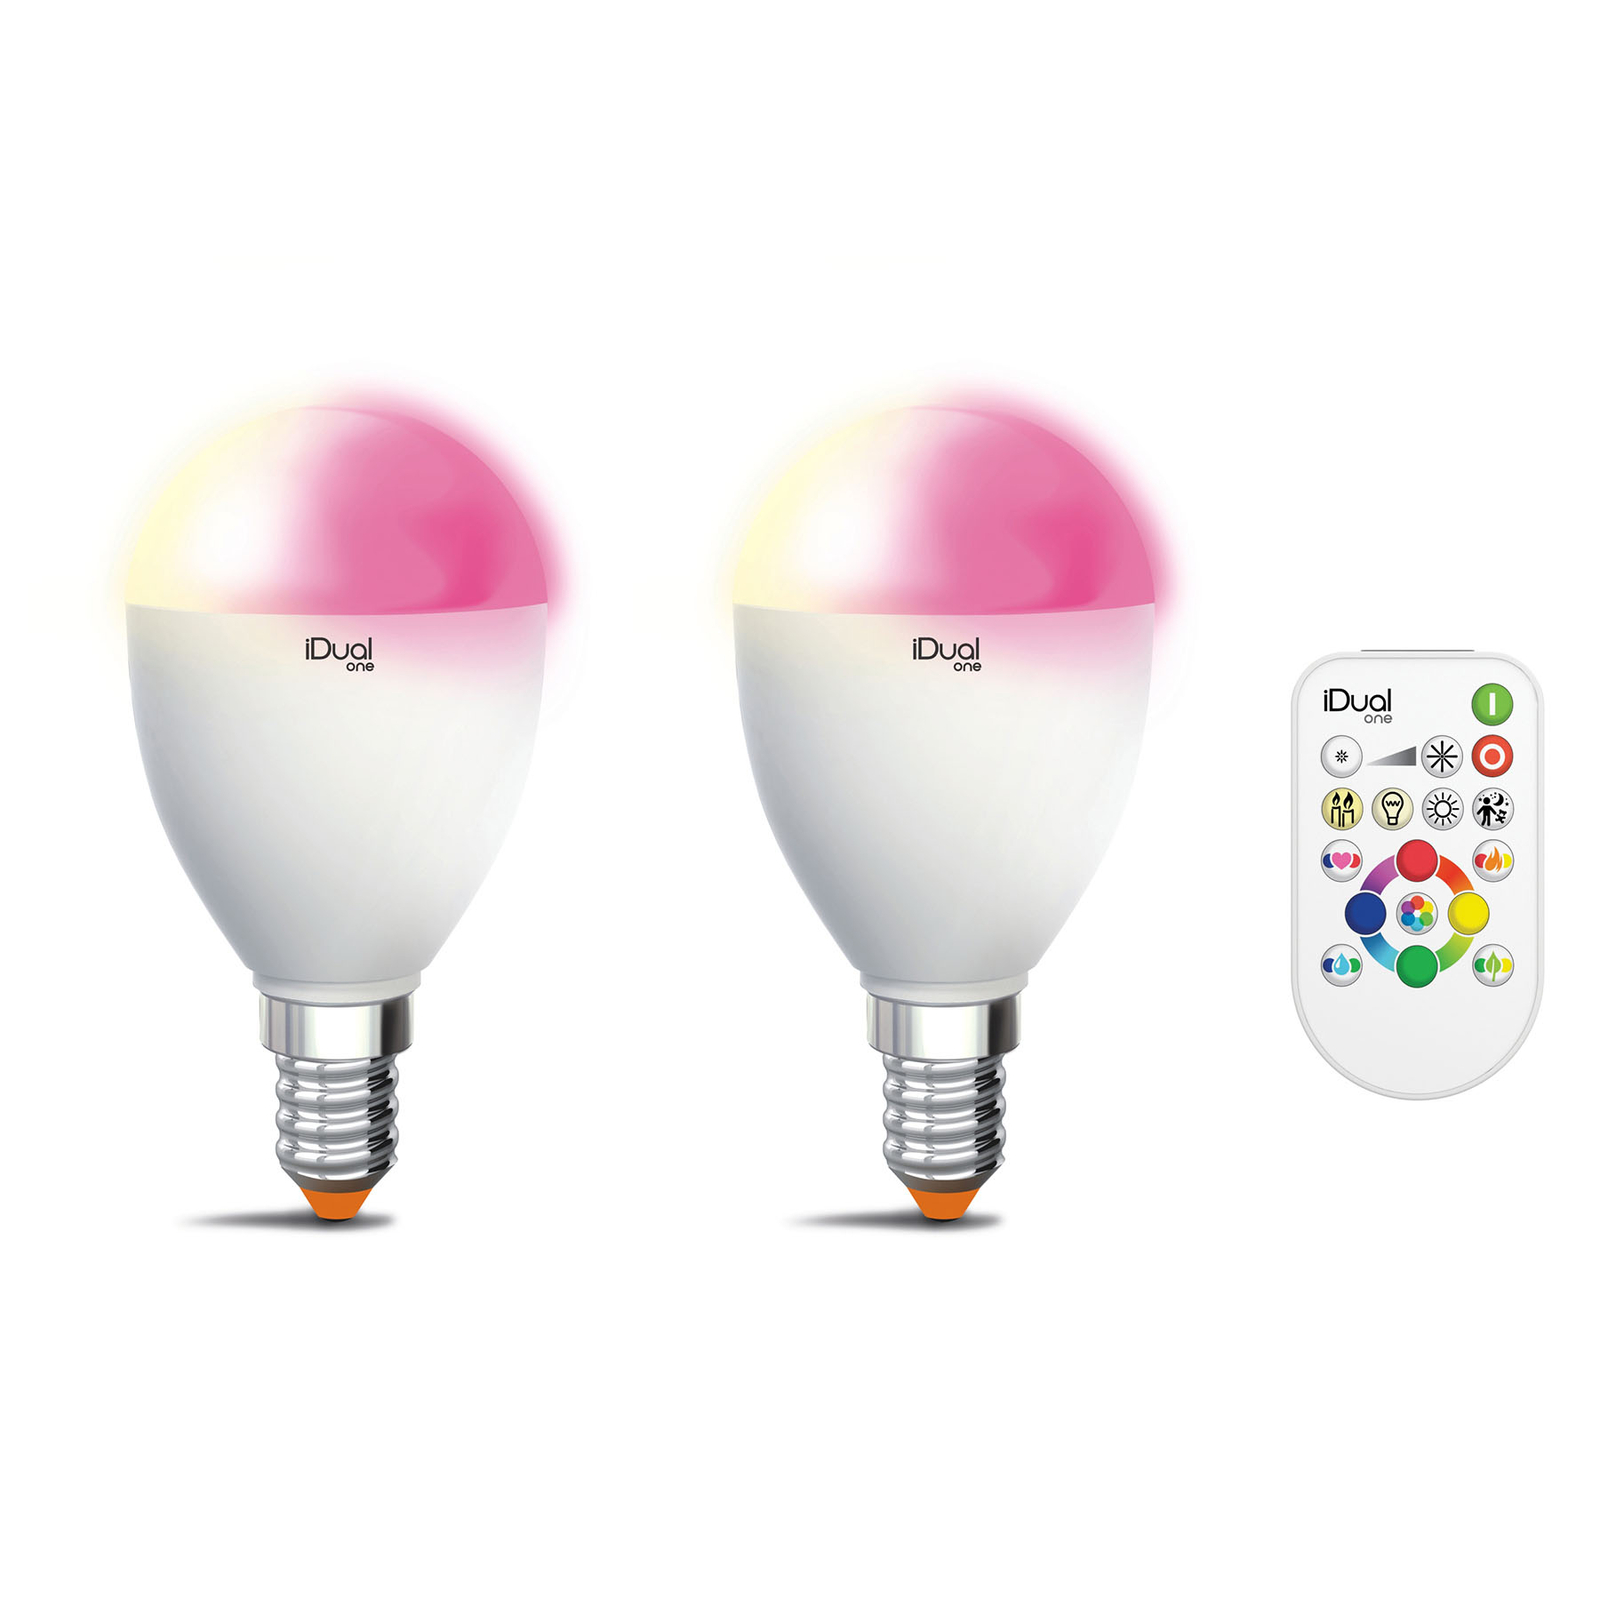 iDual One E14 5,3W RGBW lot de 2, télécommande